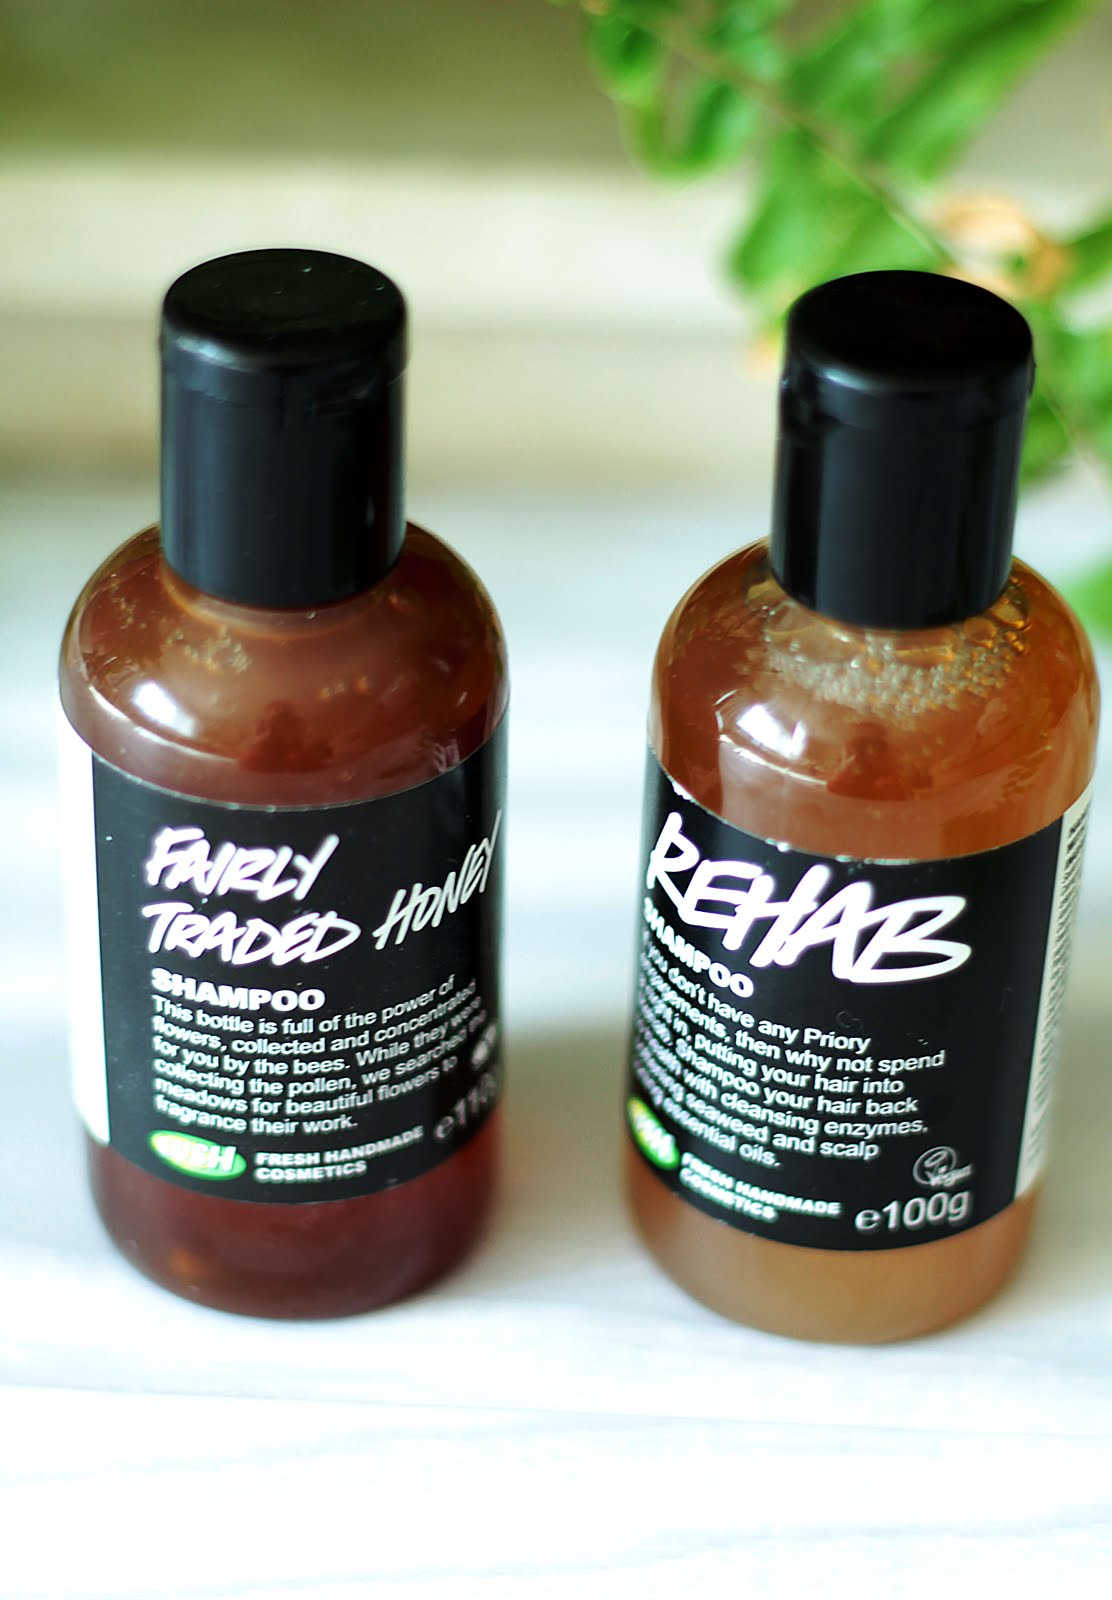 Lush hair care summer haul fairly traded honey and rehab